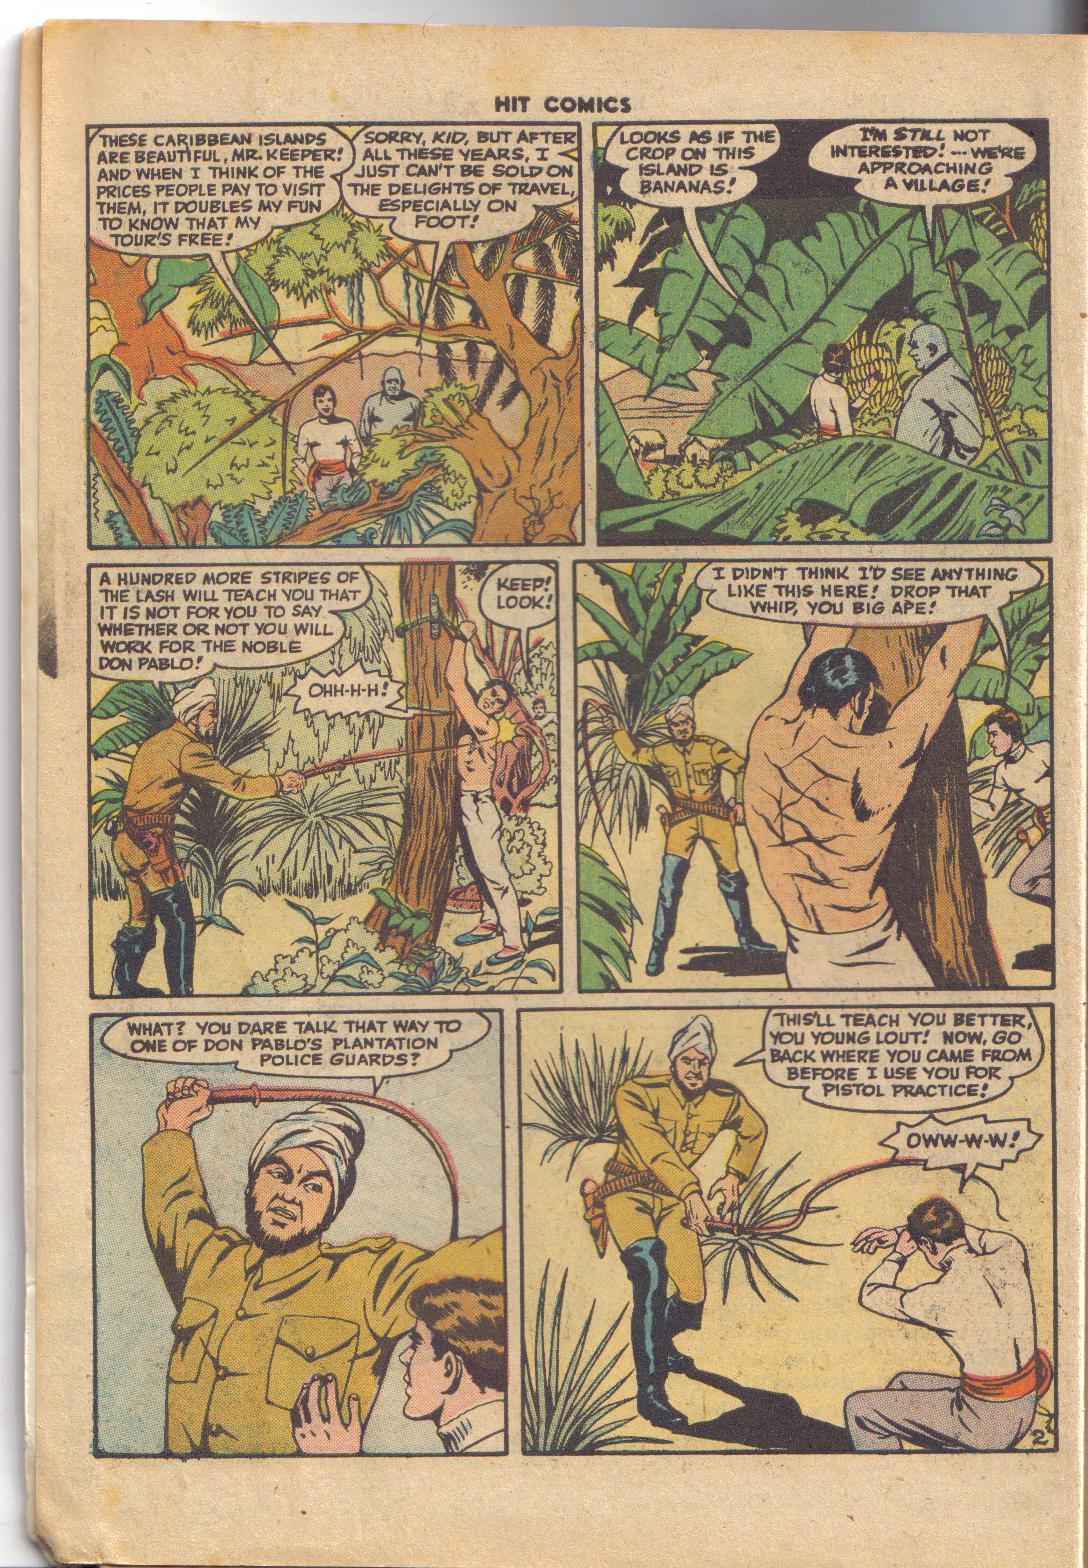 Read online Hit Comics comic -  Issue #45 - 4